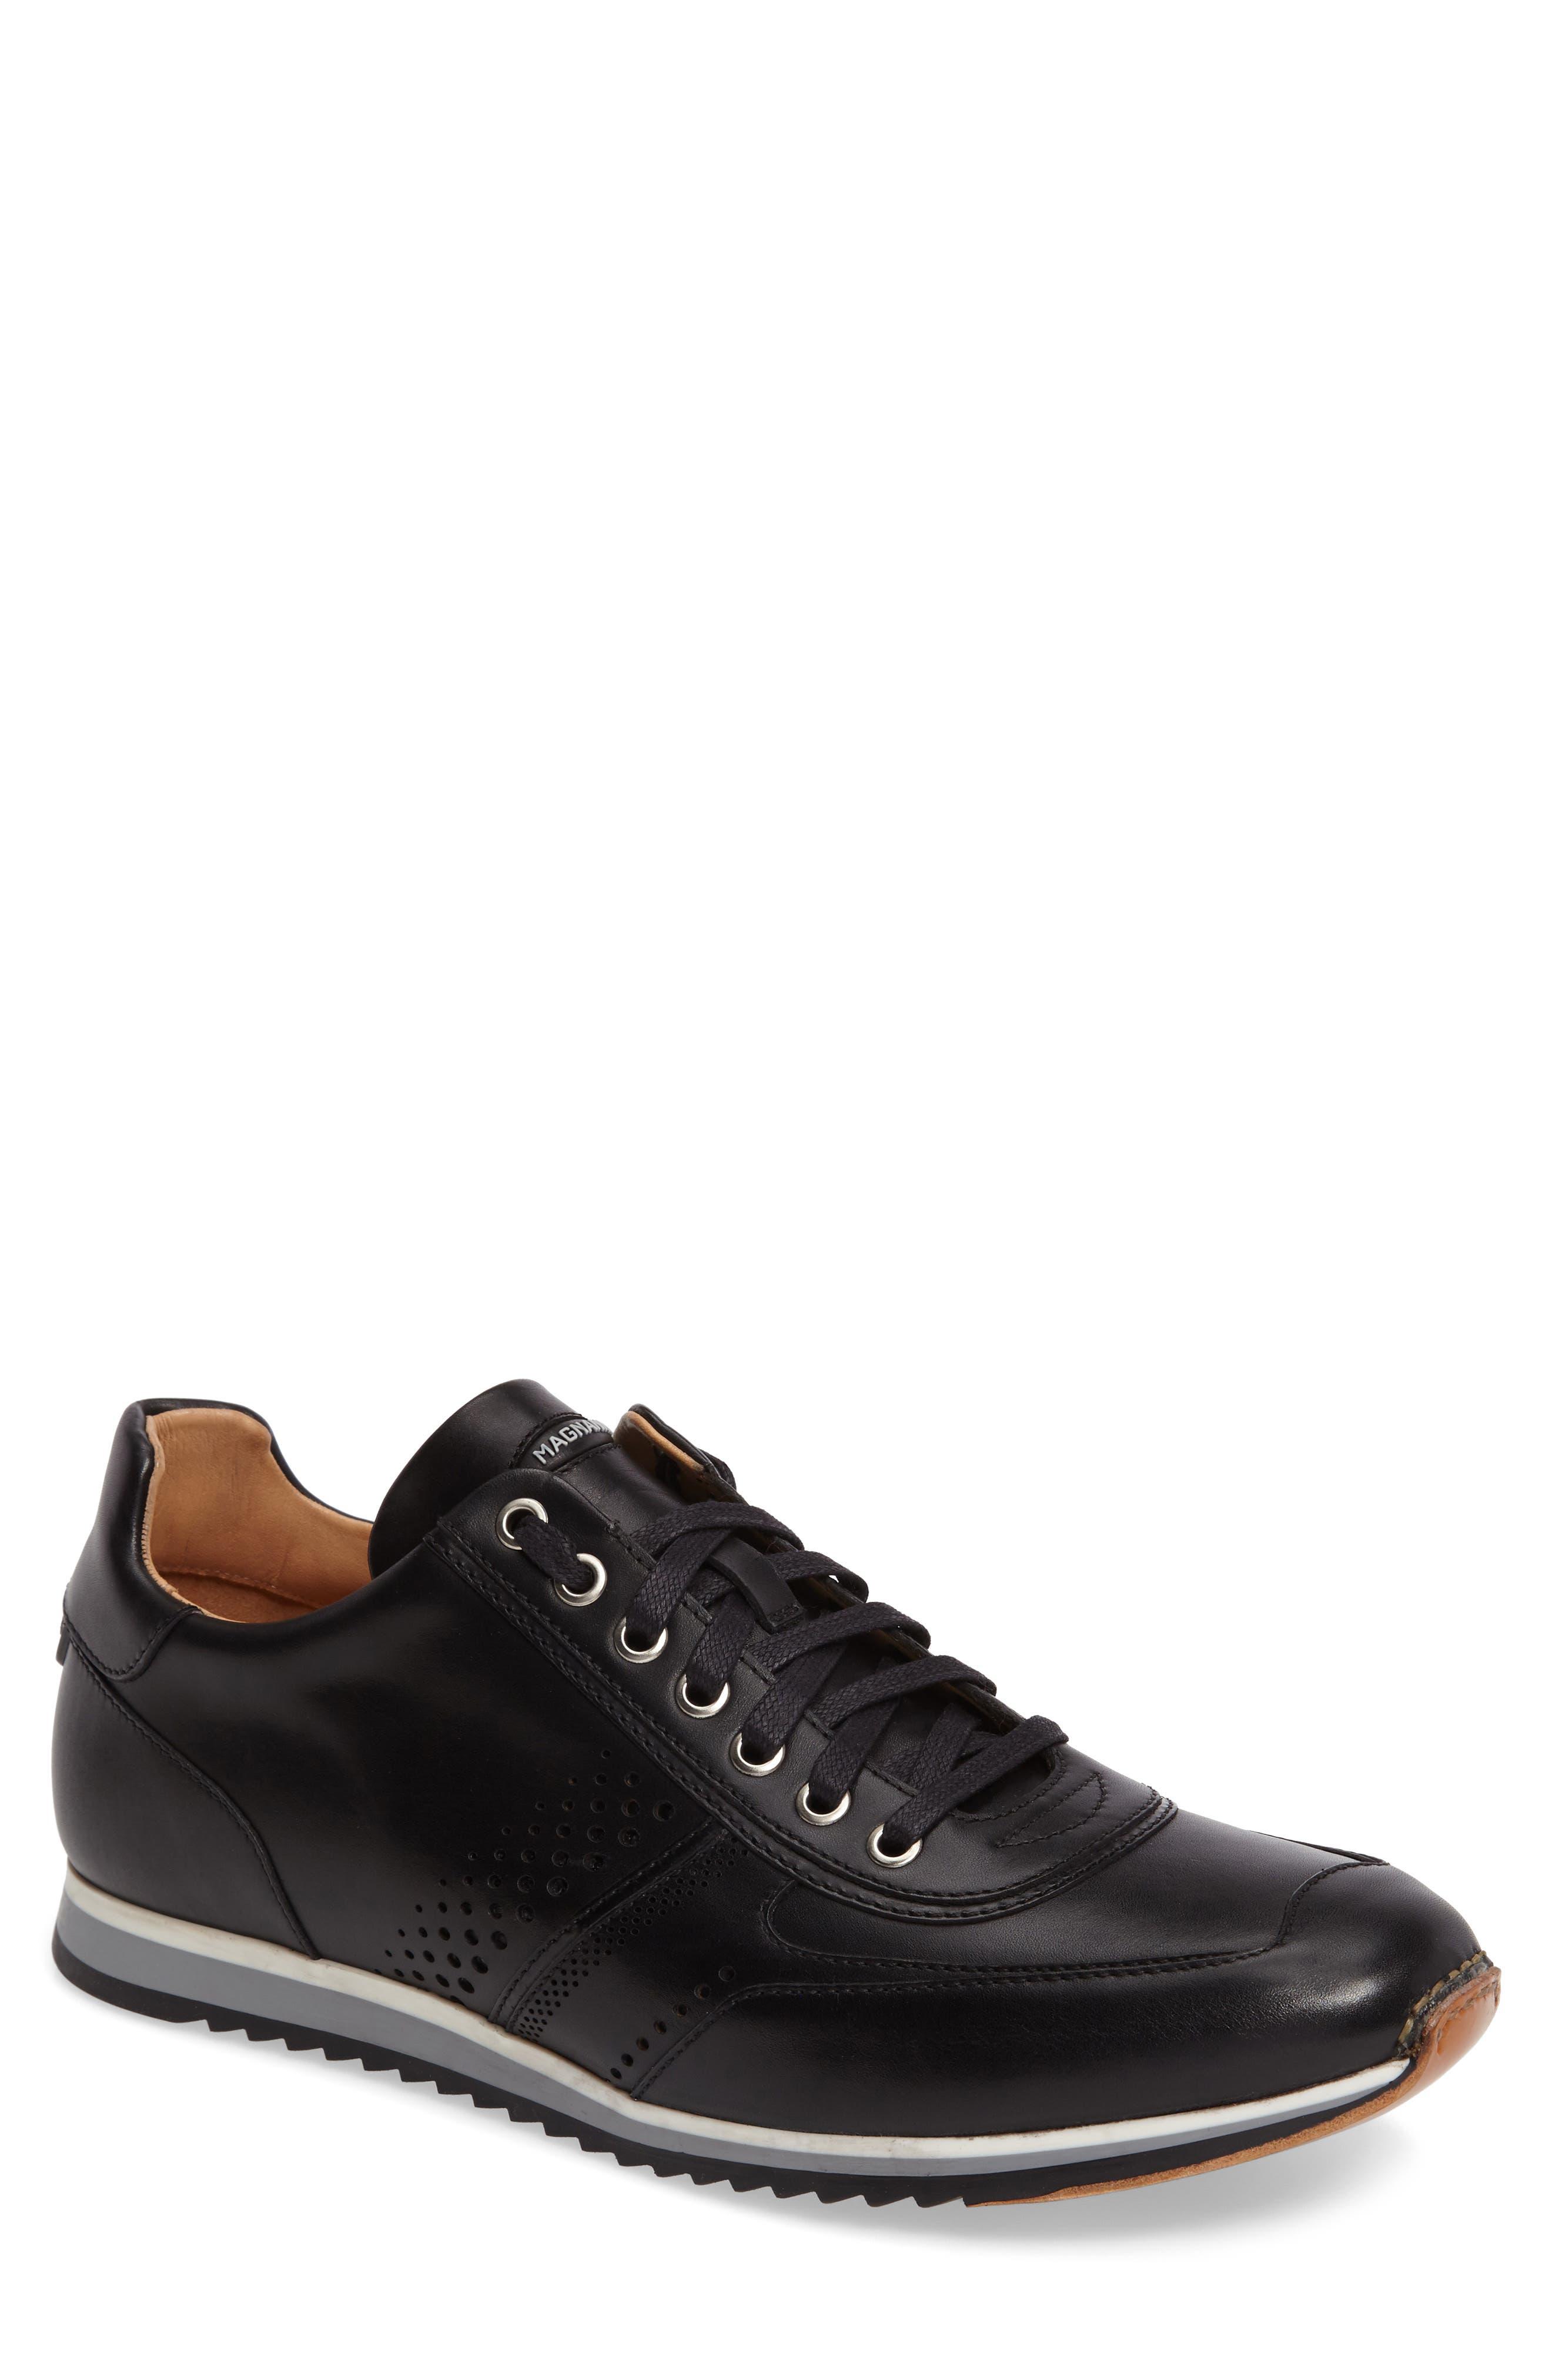 Alternate Image 1 Selected - Magnanni 'Cristian' Sneaker (Men)